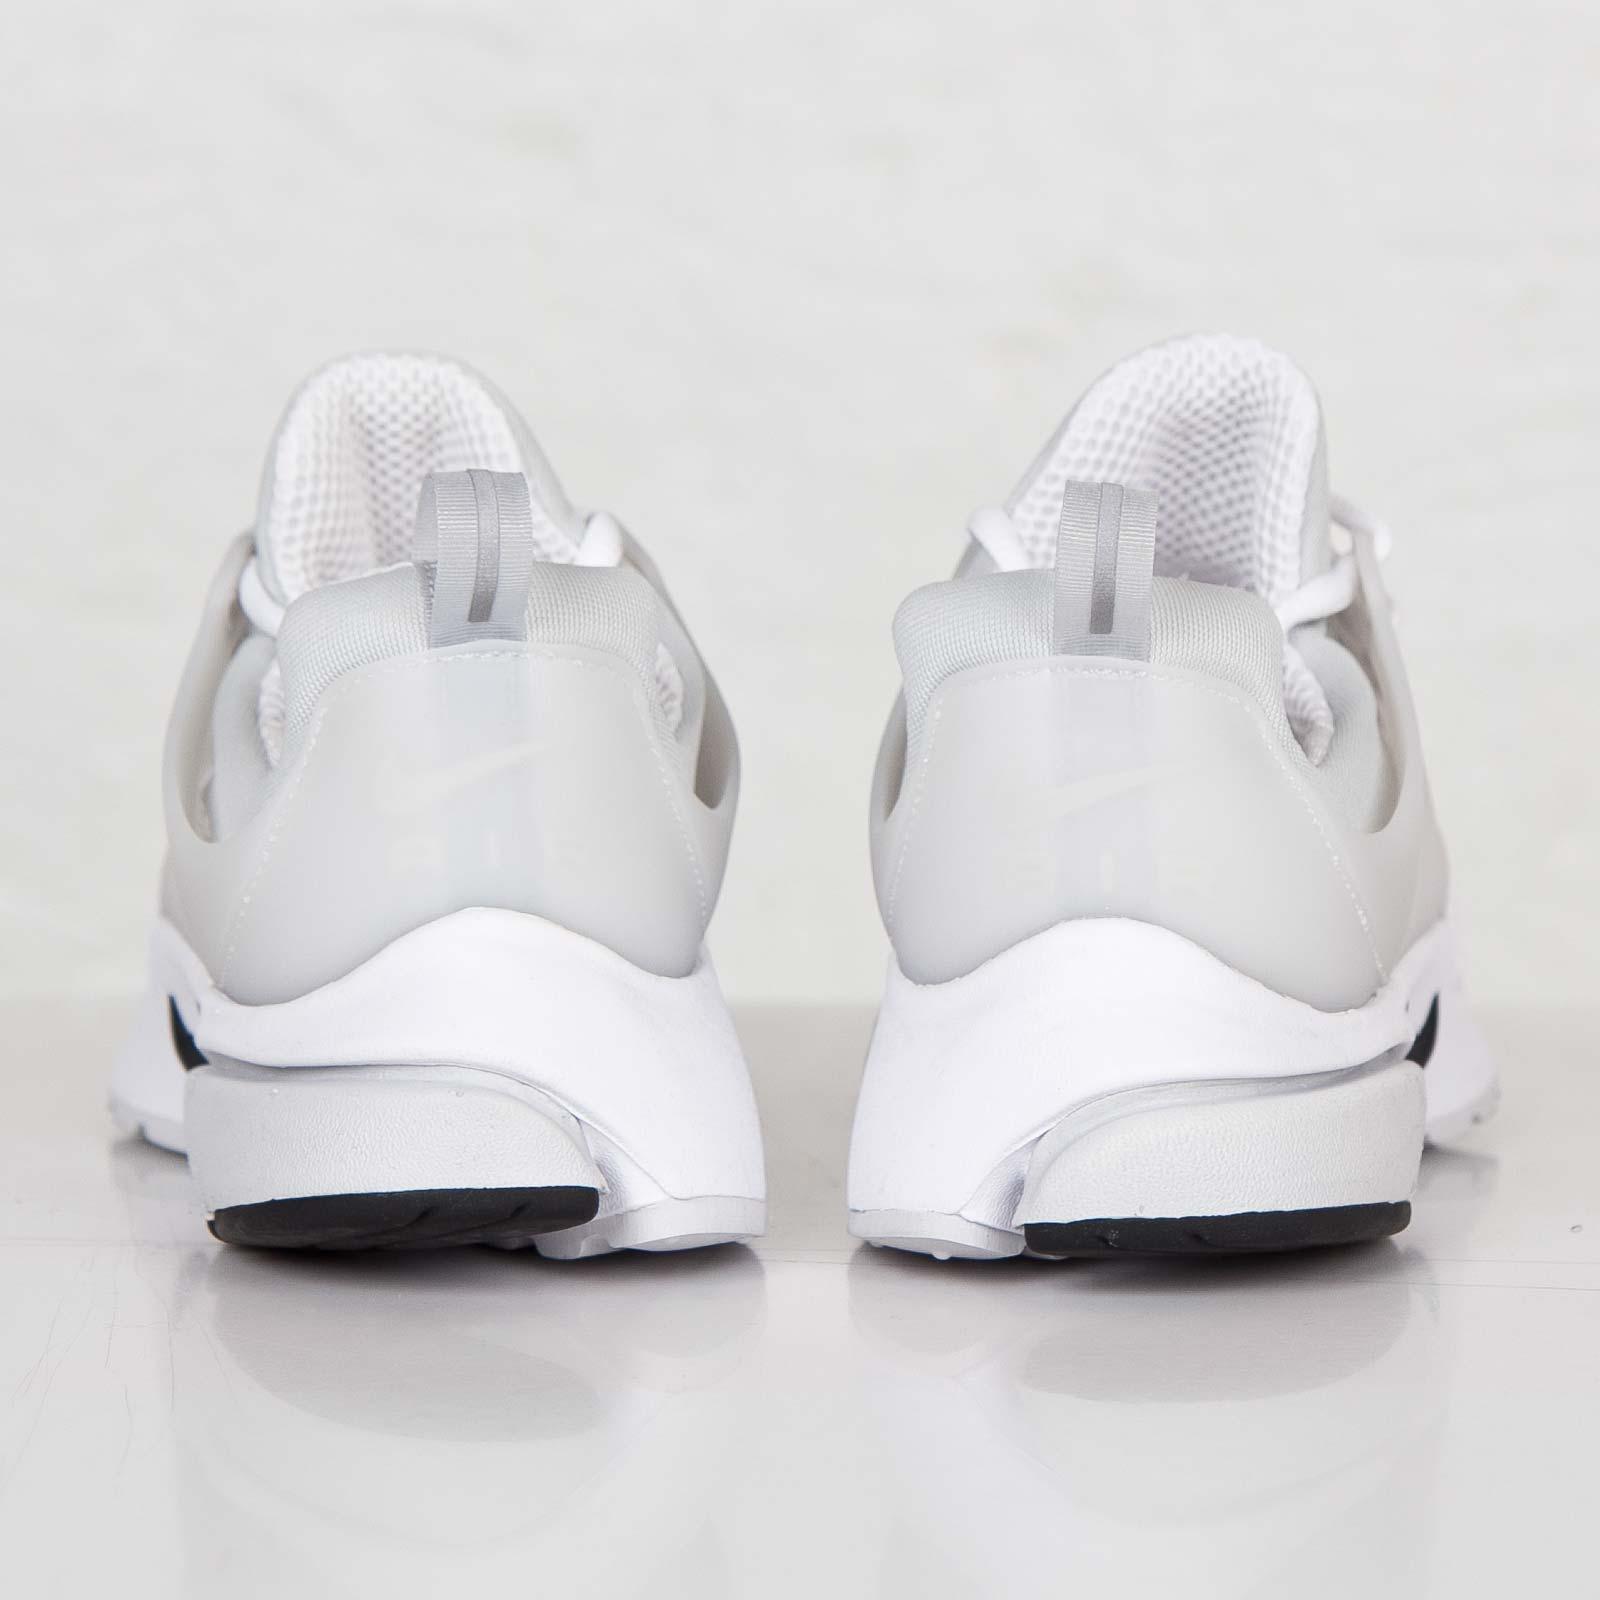 new style 487ed b0a10 Nike Air Presto Br QS - 789869-100 - Sneakersnstuff   sneakers   streetwear  online since 1999